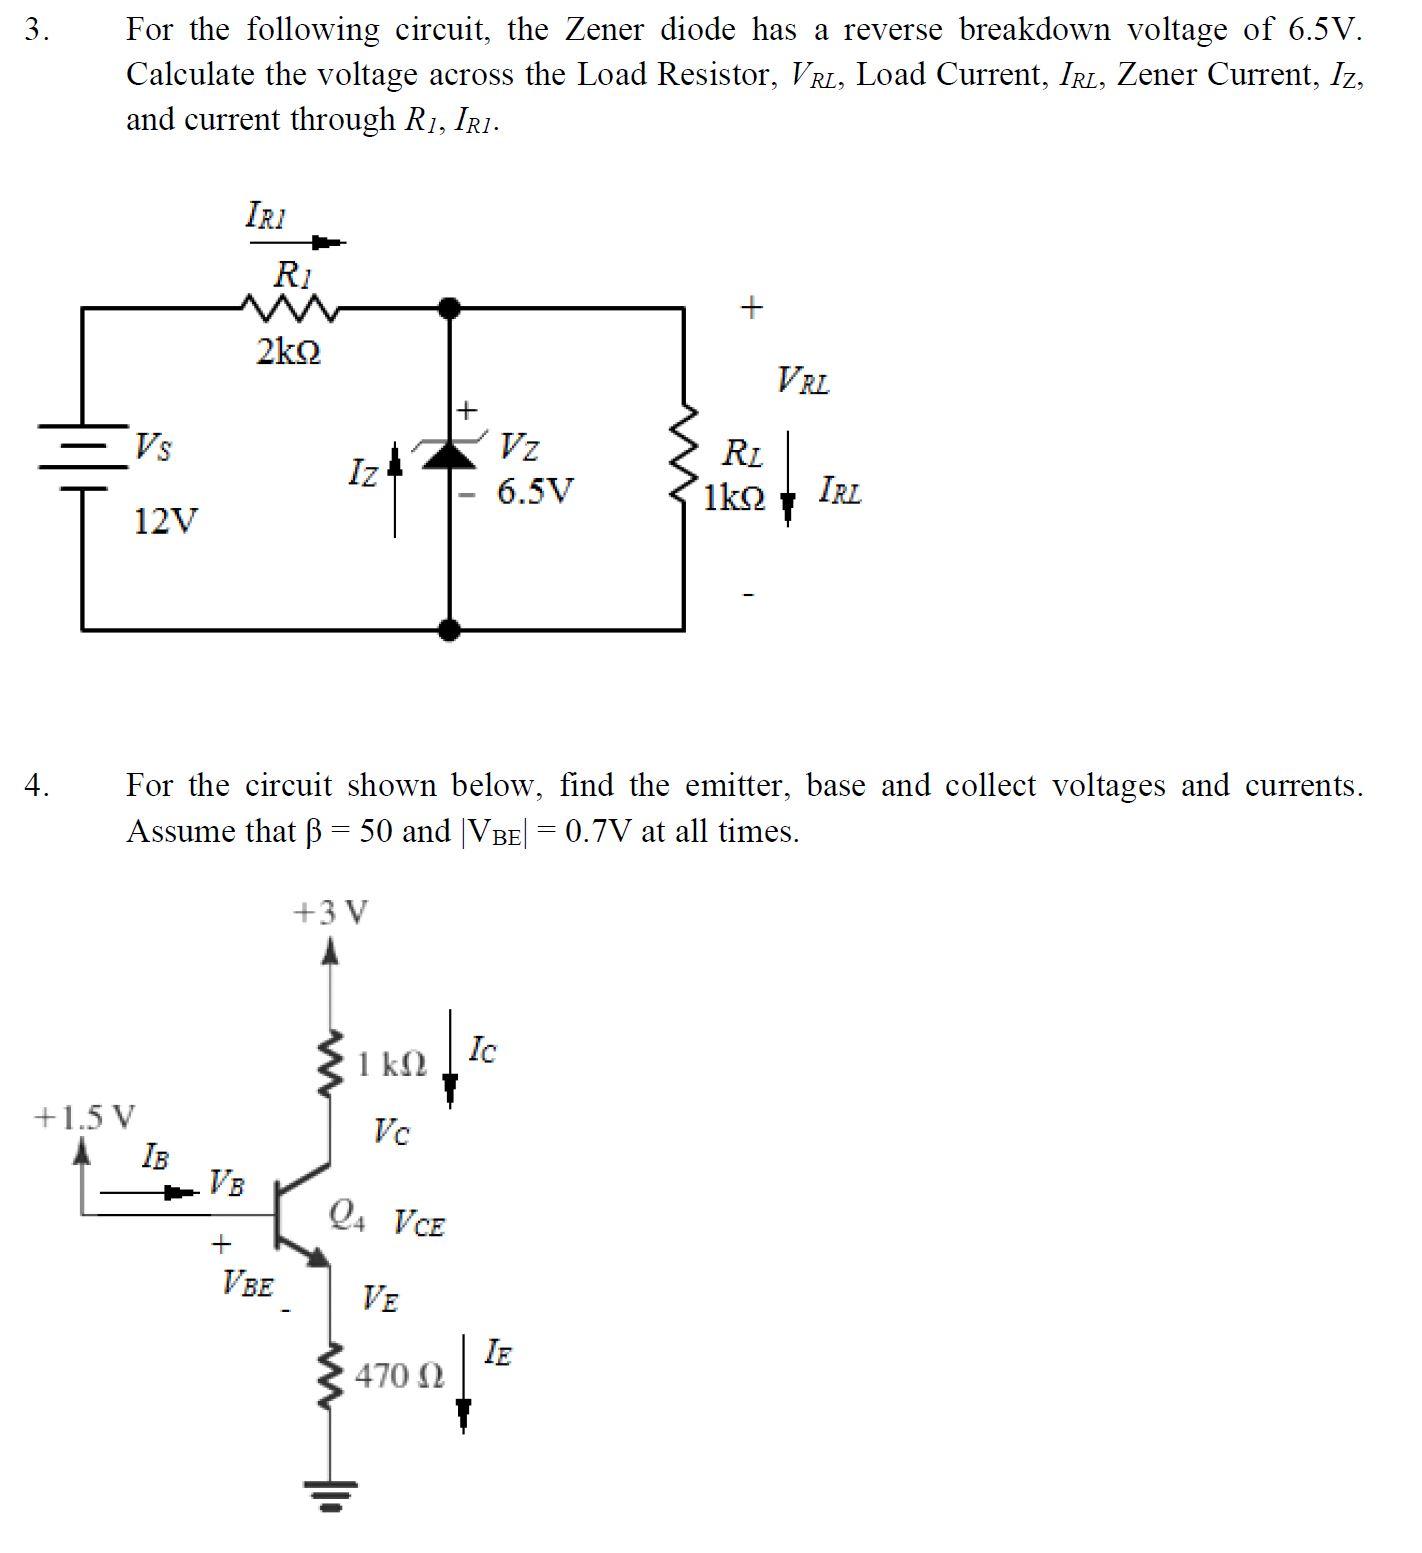 94 Supra Wiring Diagram Nissan 300zx Twin Turbo Engine Vacuum Hose Light 89